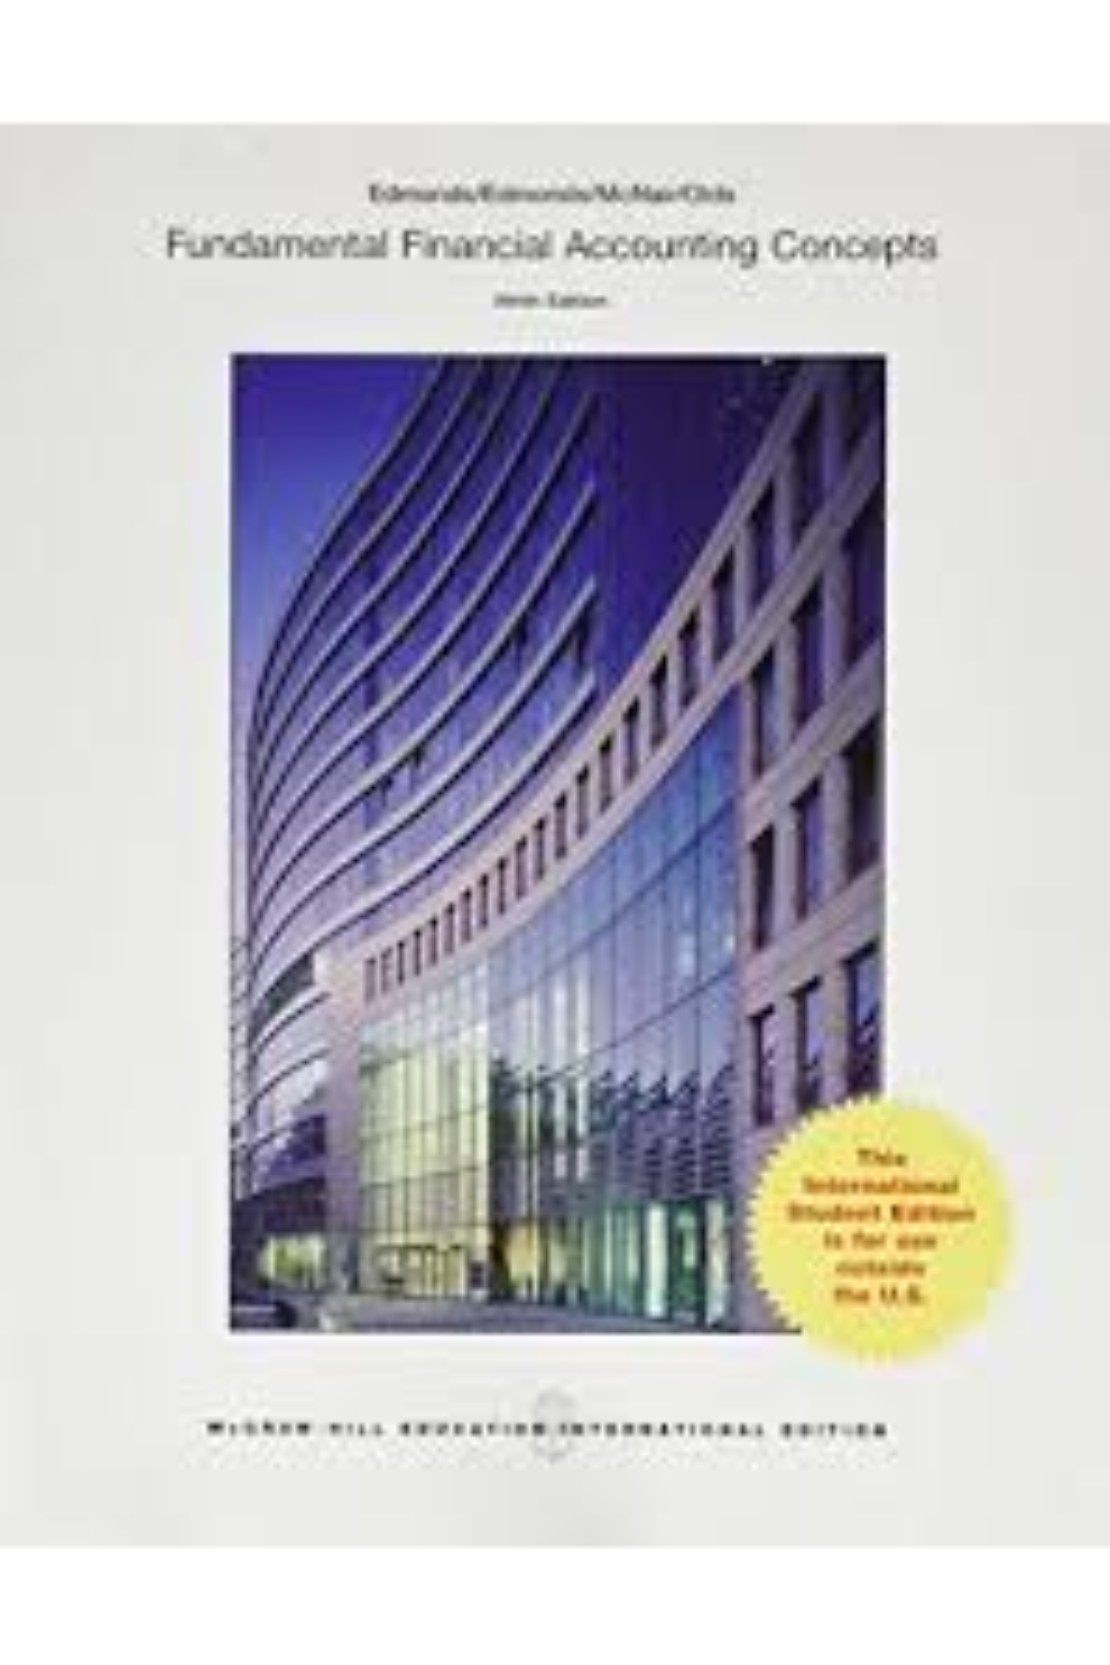 382dfb4d4bfcd Fundamental Financial Accounting Concepts 9 E (PB) BooksInn Shop Pakistan